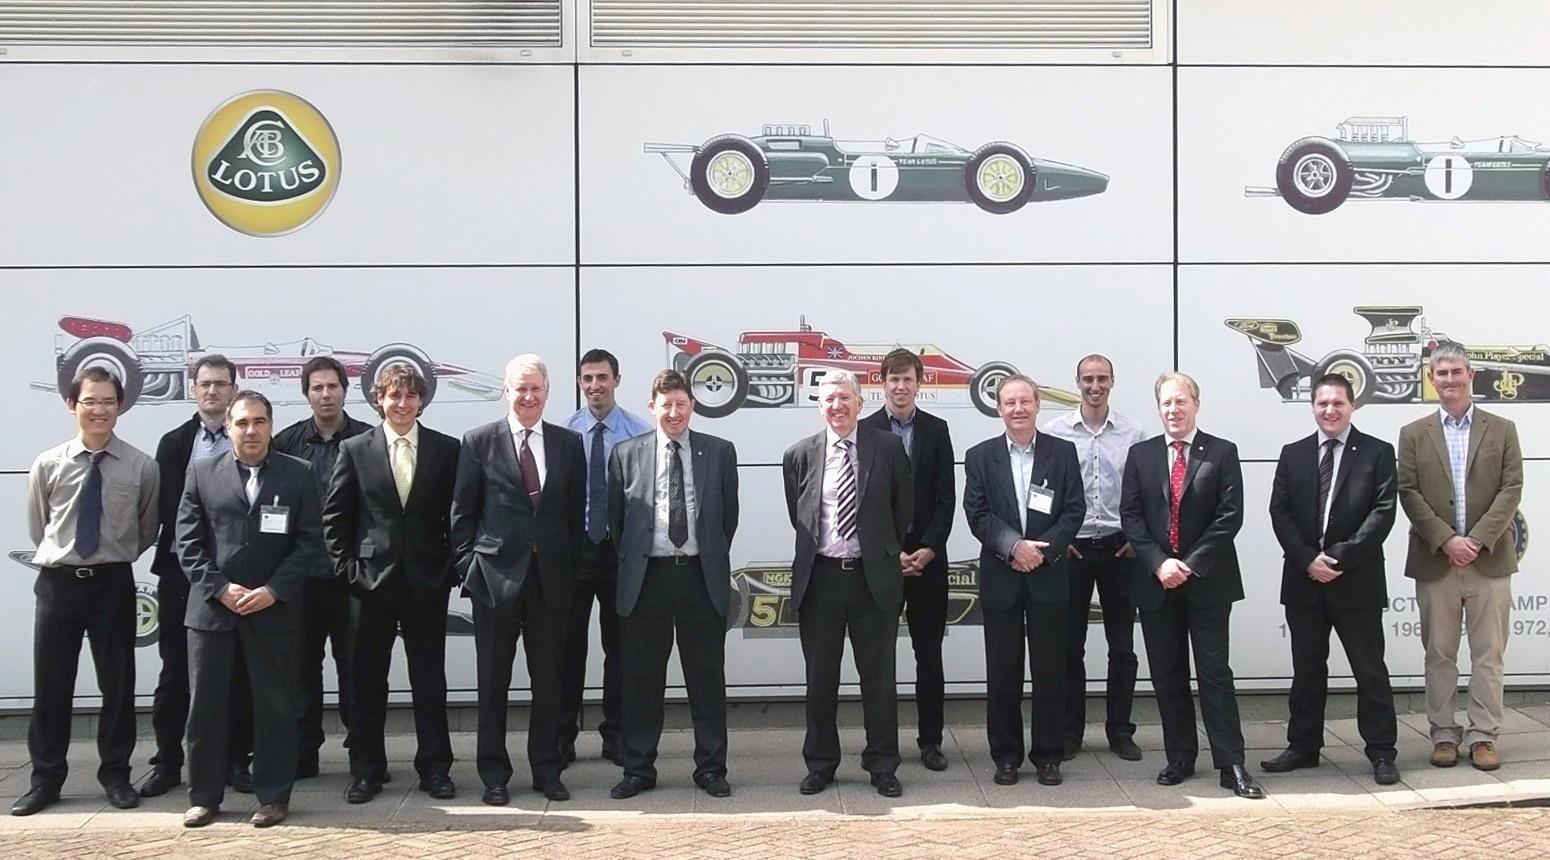 Venus Project Partners at M6 meeting (Lotus Eng., UK)